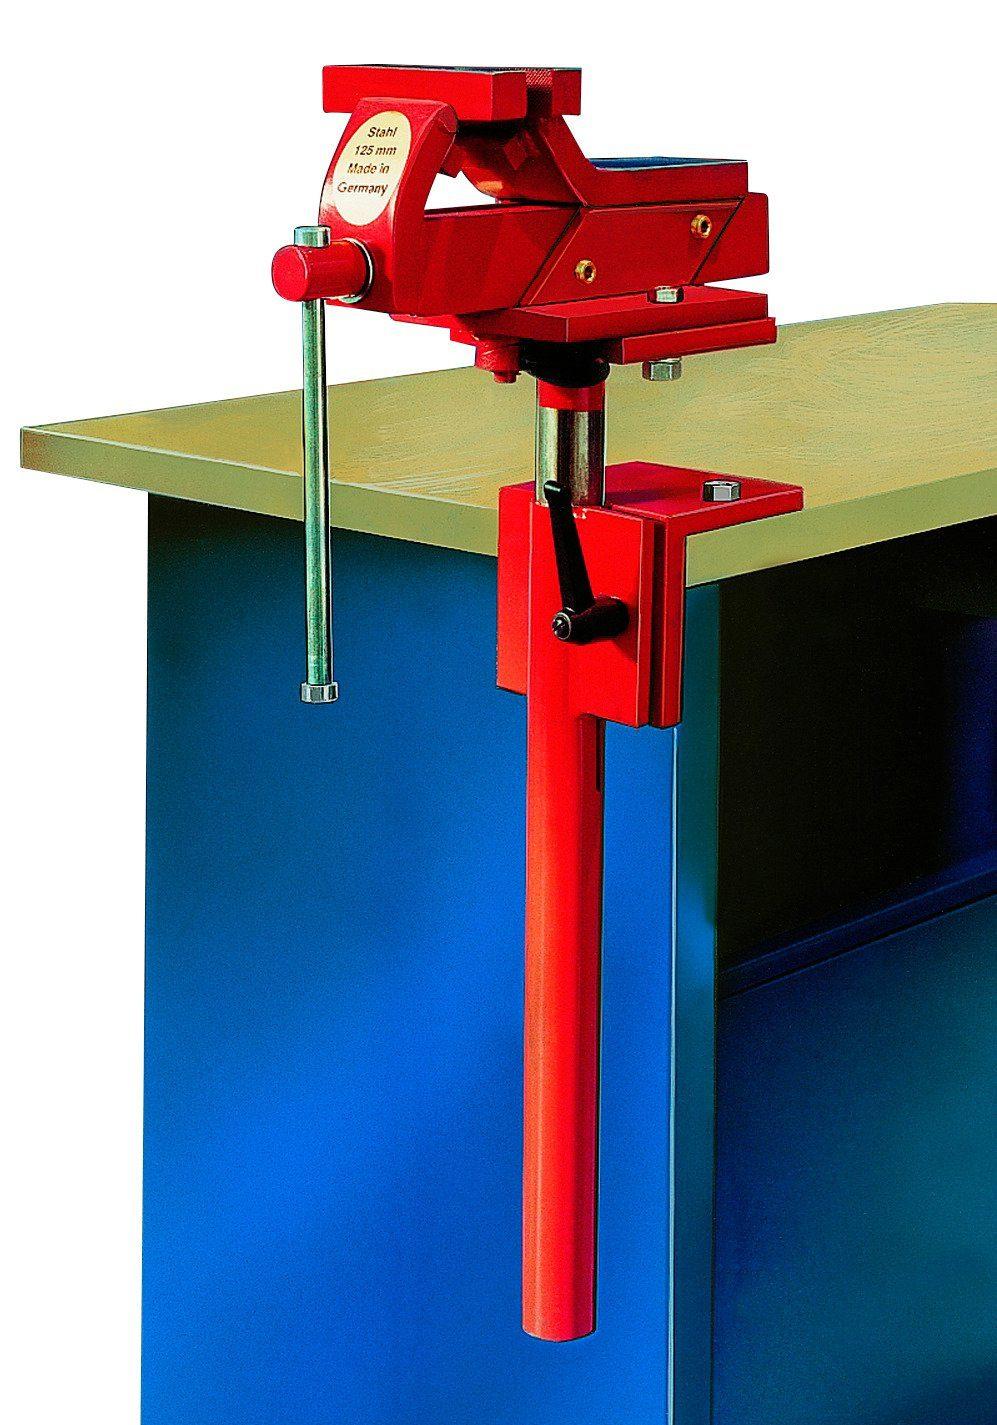 Küpper Schraubstock »125 mm, höhenverstellbar«